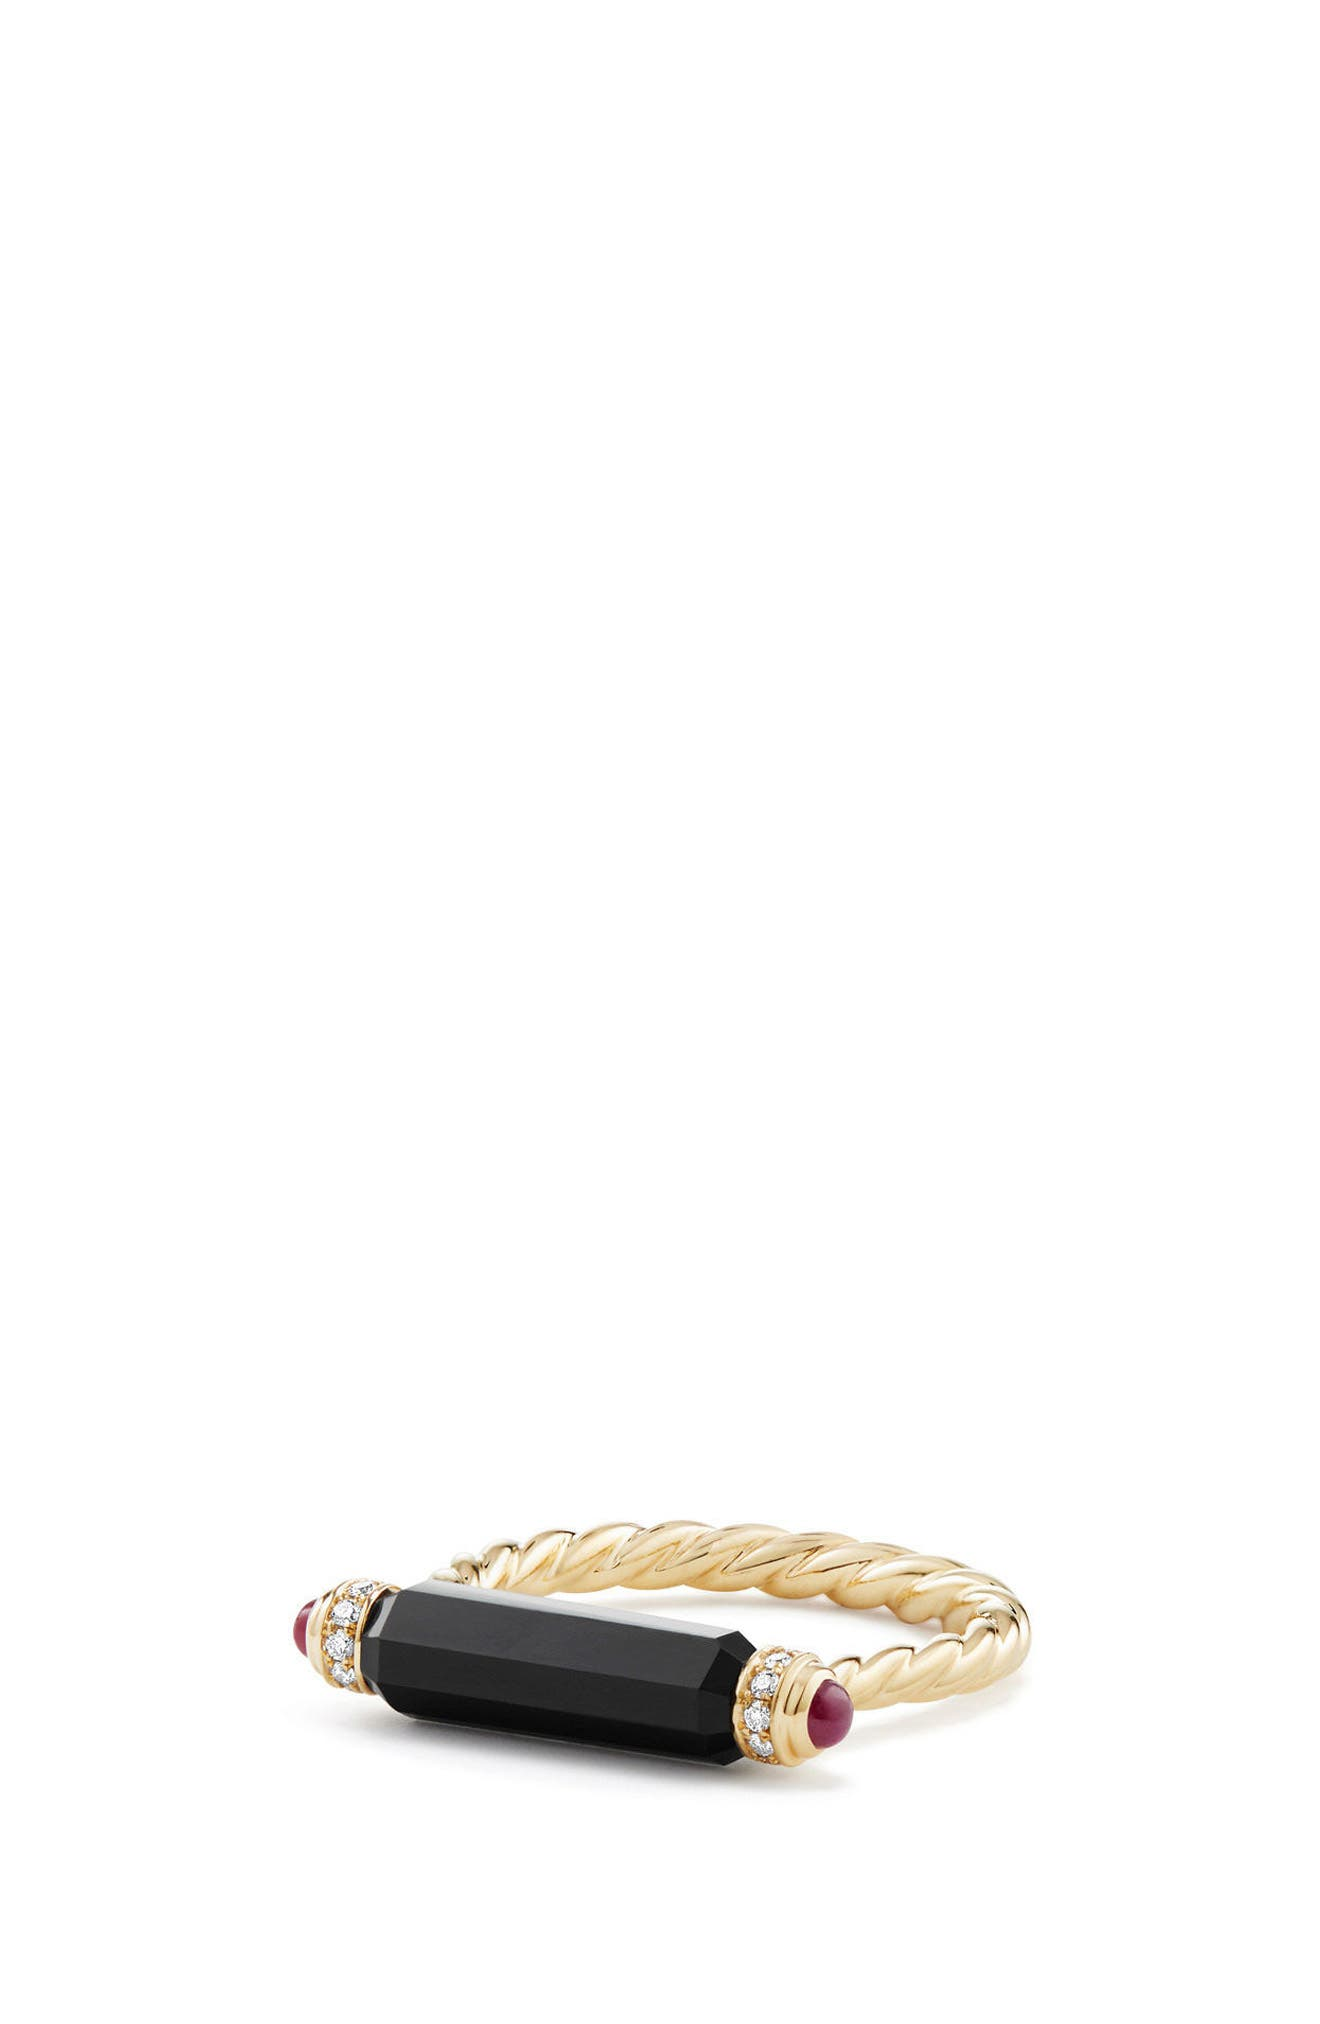 DAVID YURMAN Barrels Ring with Diamonds in 18K Gold, Main, color, BLACK ONYX